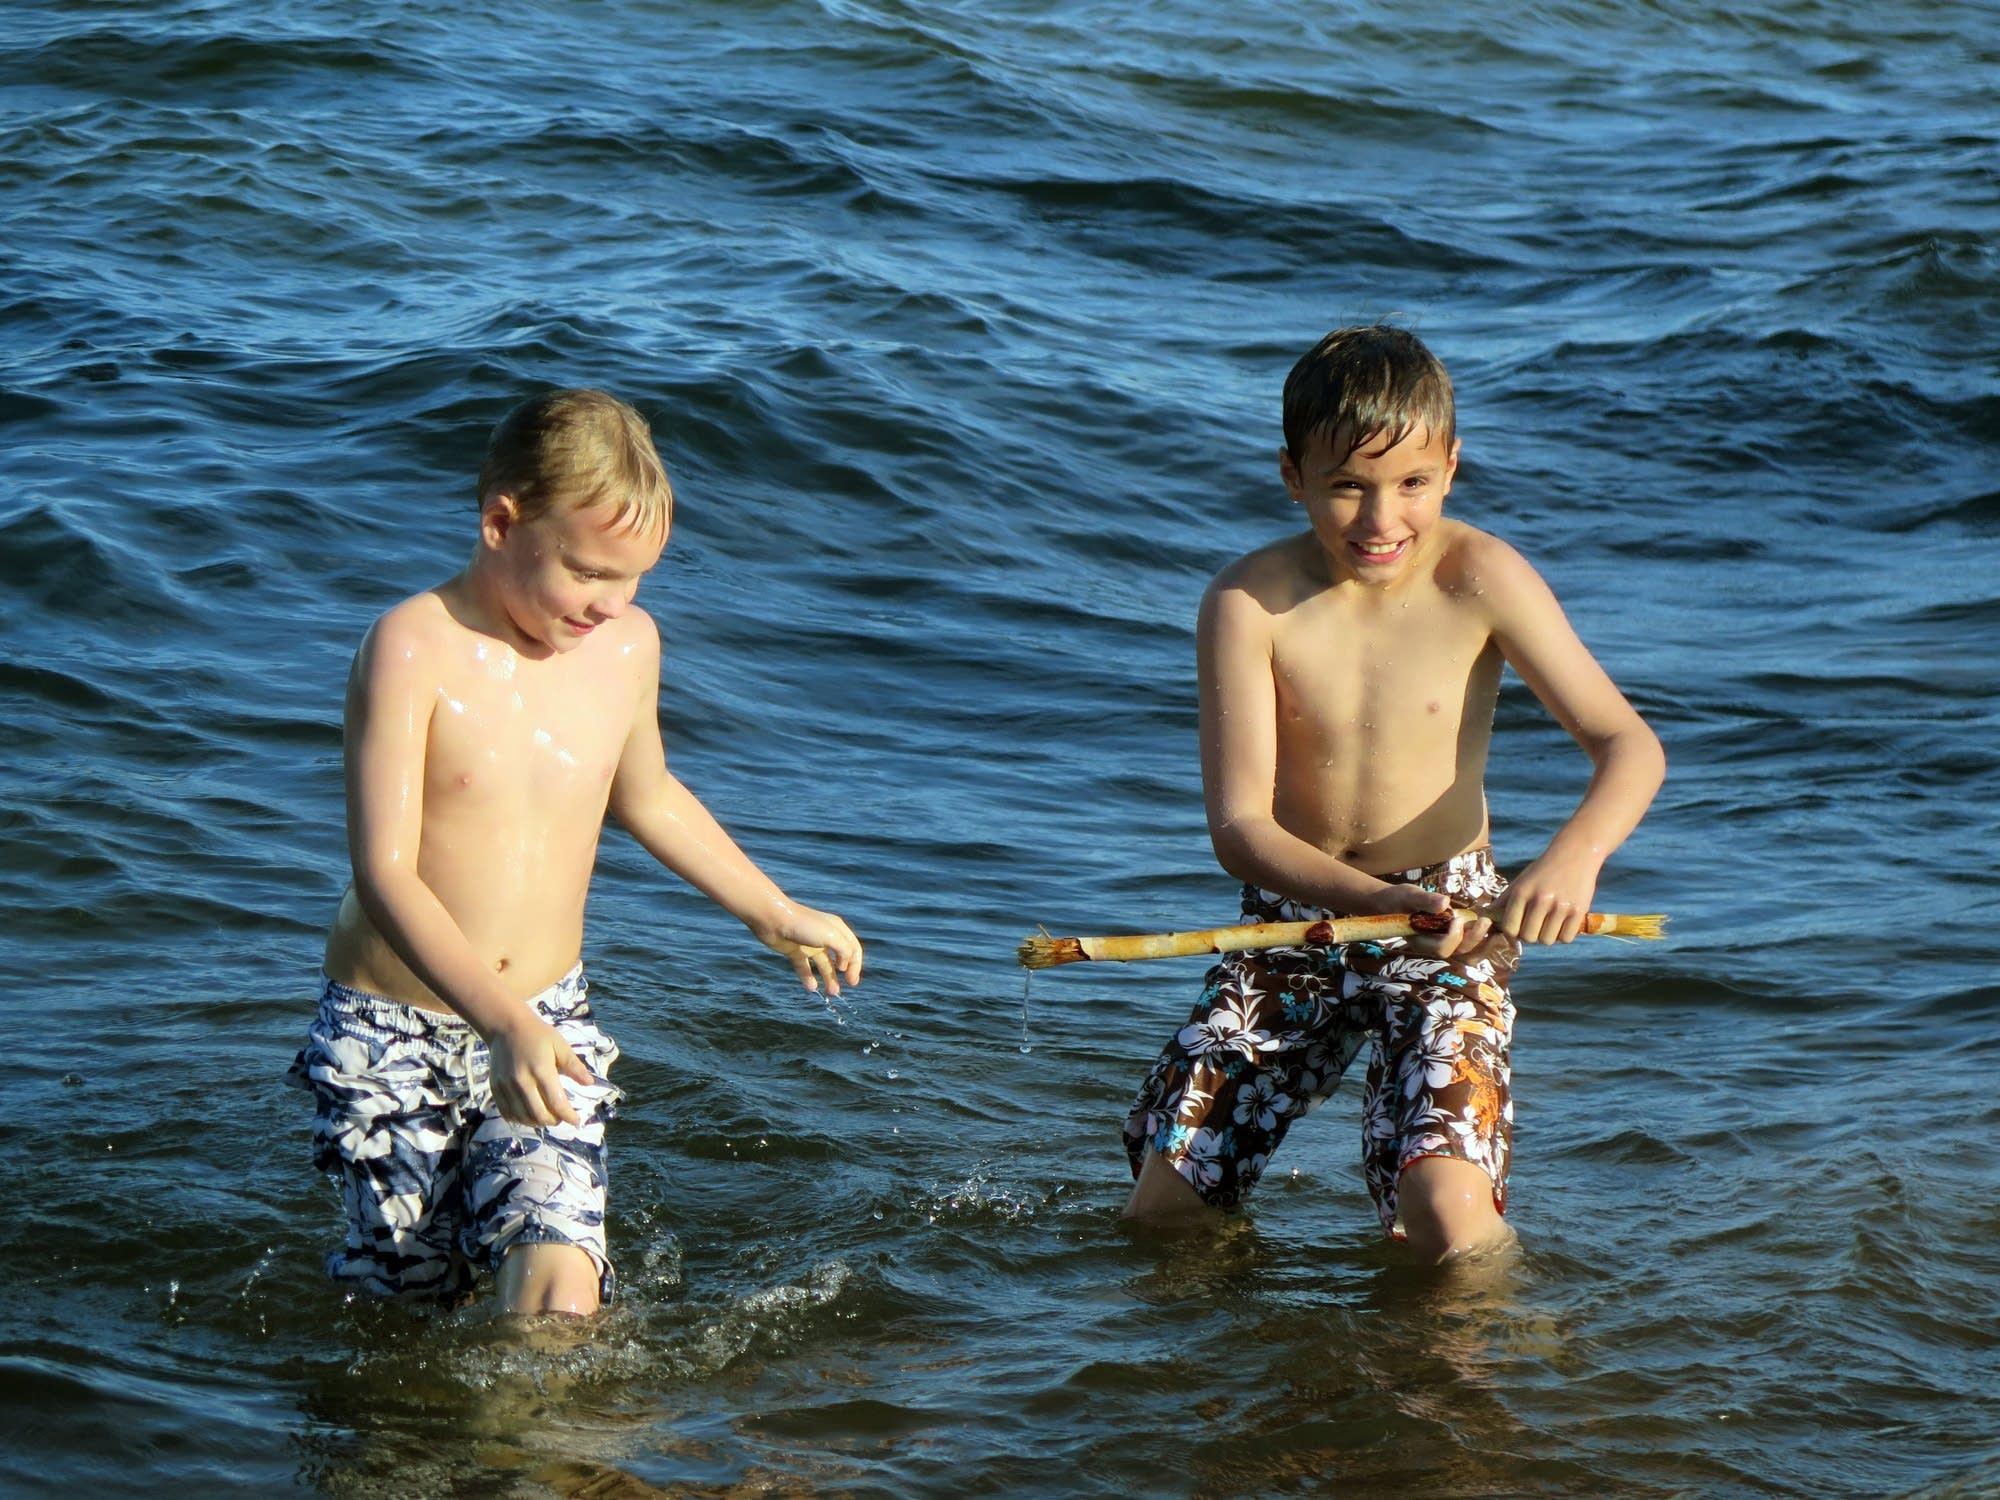 Landon and Gage Jones play in Lake Superior.